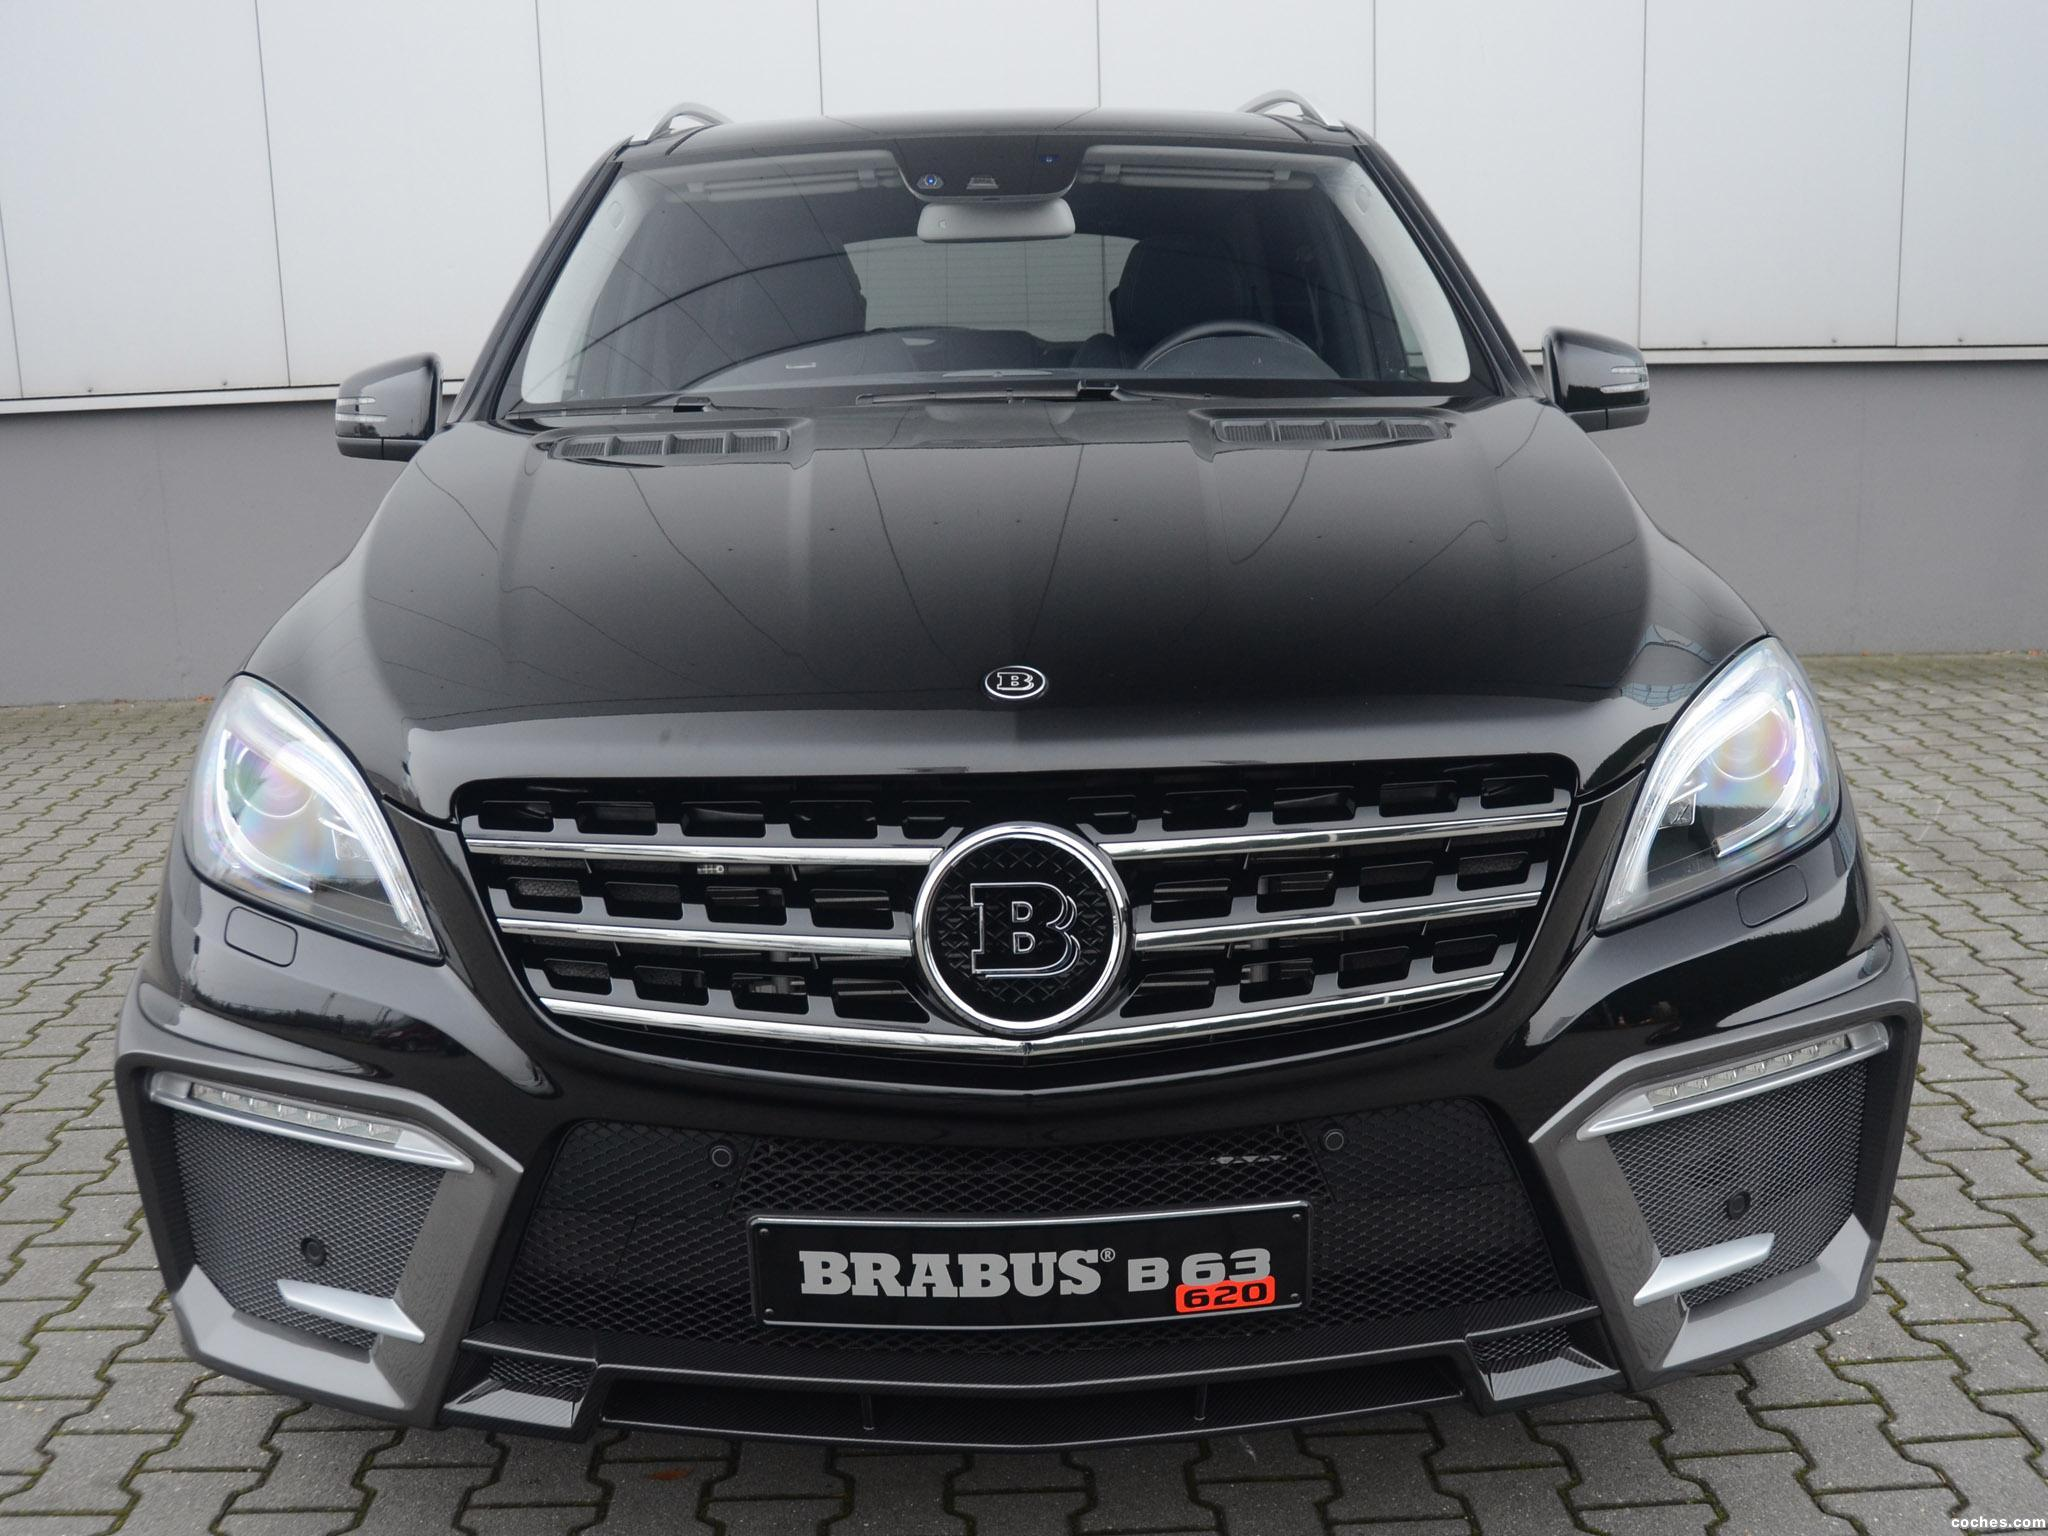 Foto 0 de Brabus Mercedes ML63 AMG B63 620 2012